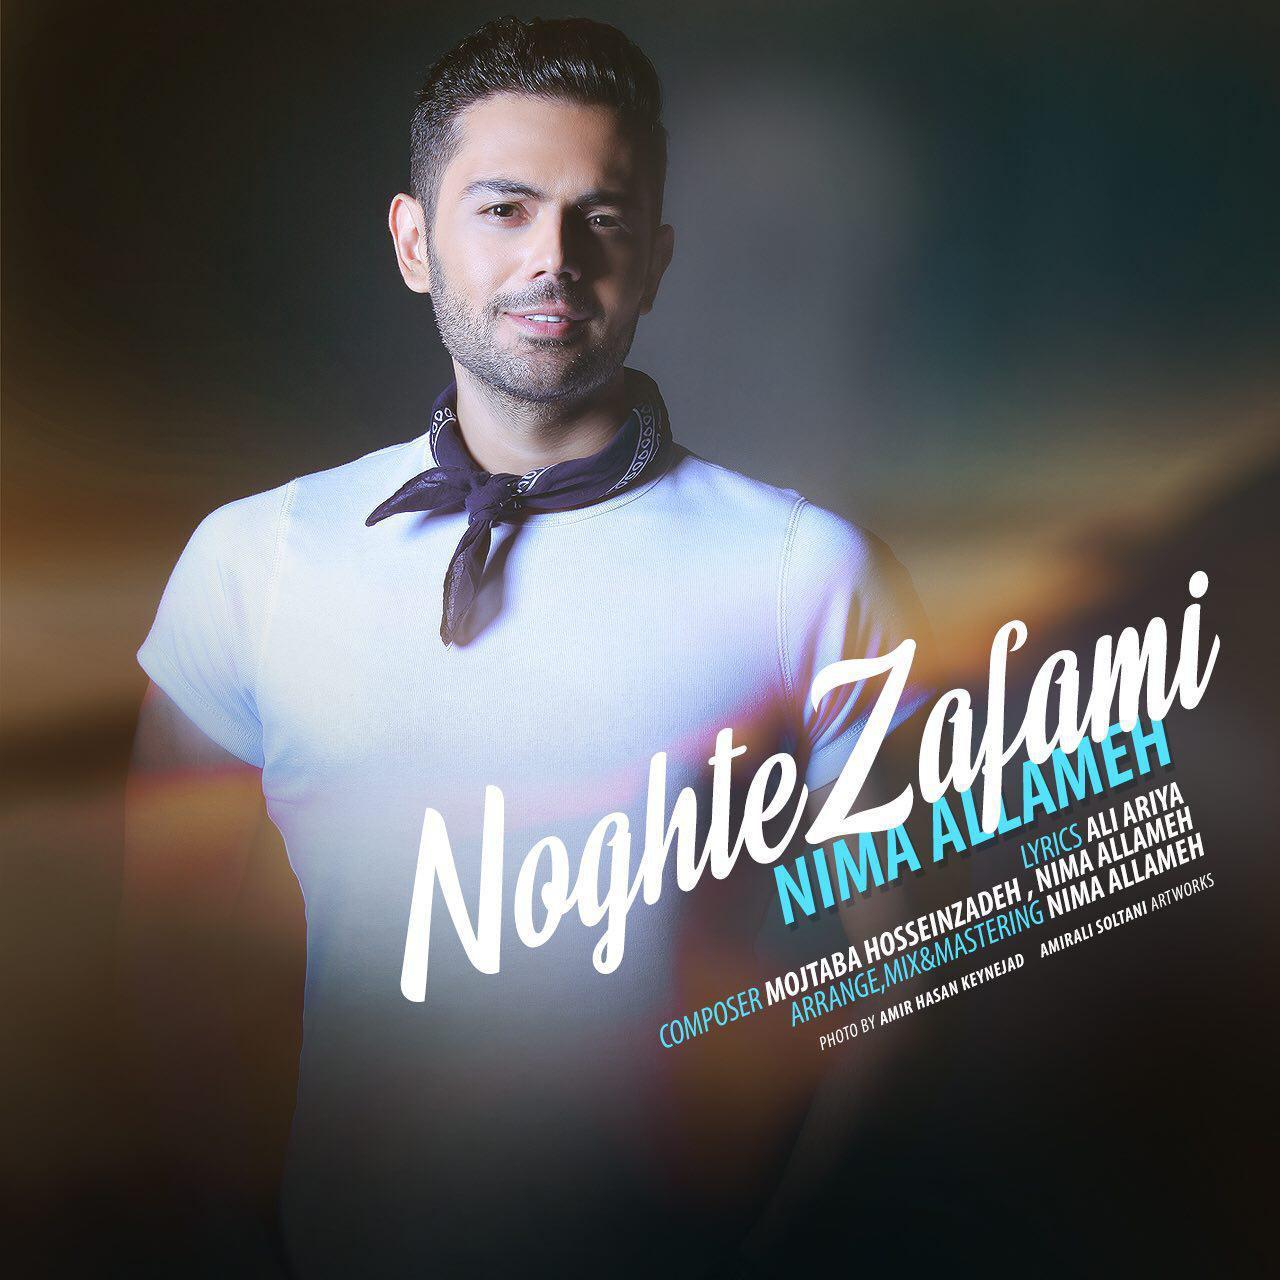 Noghte Zafami